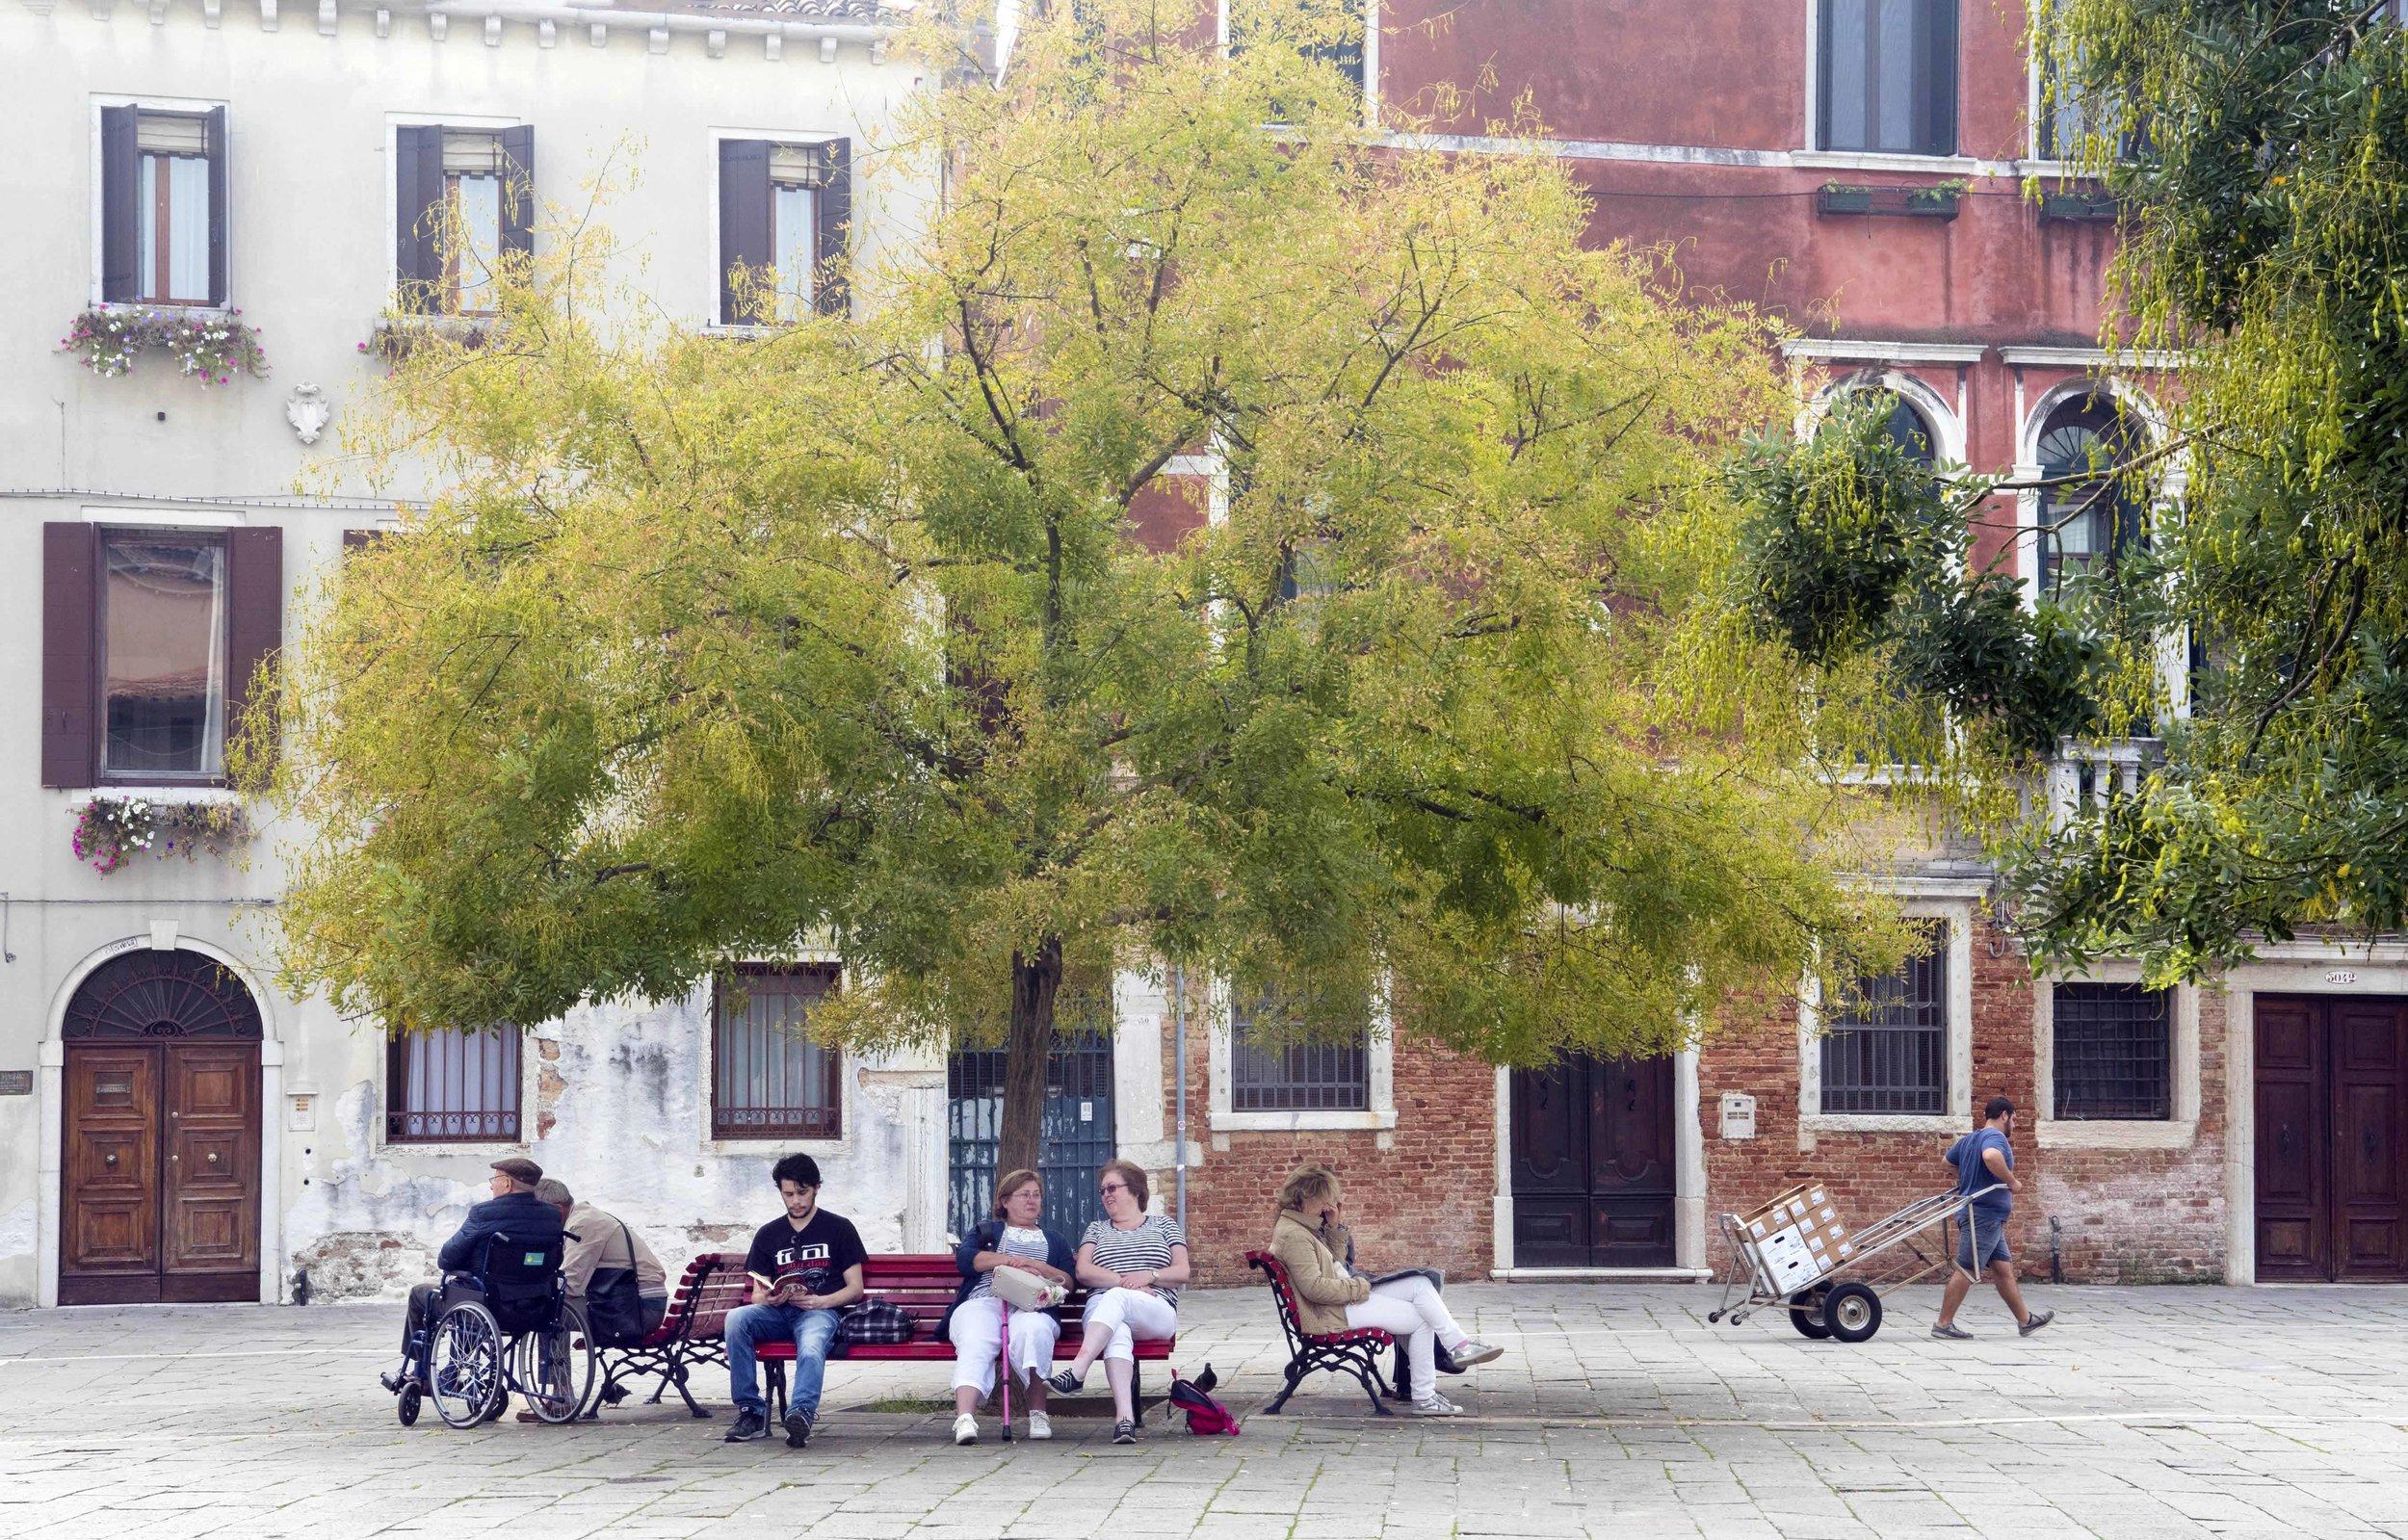 Tree Shade - Daily Life and  People.jpg